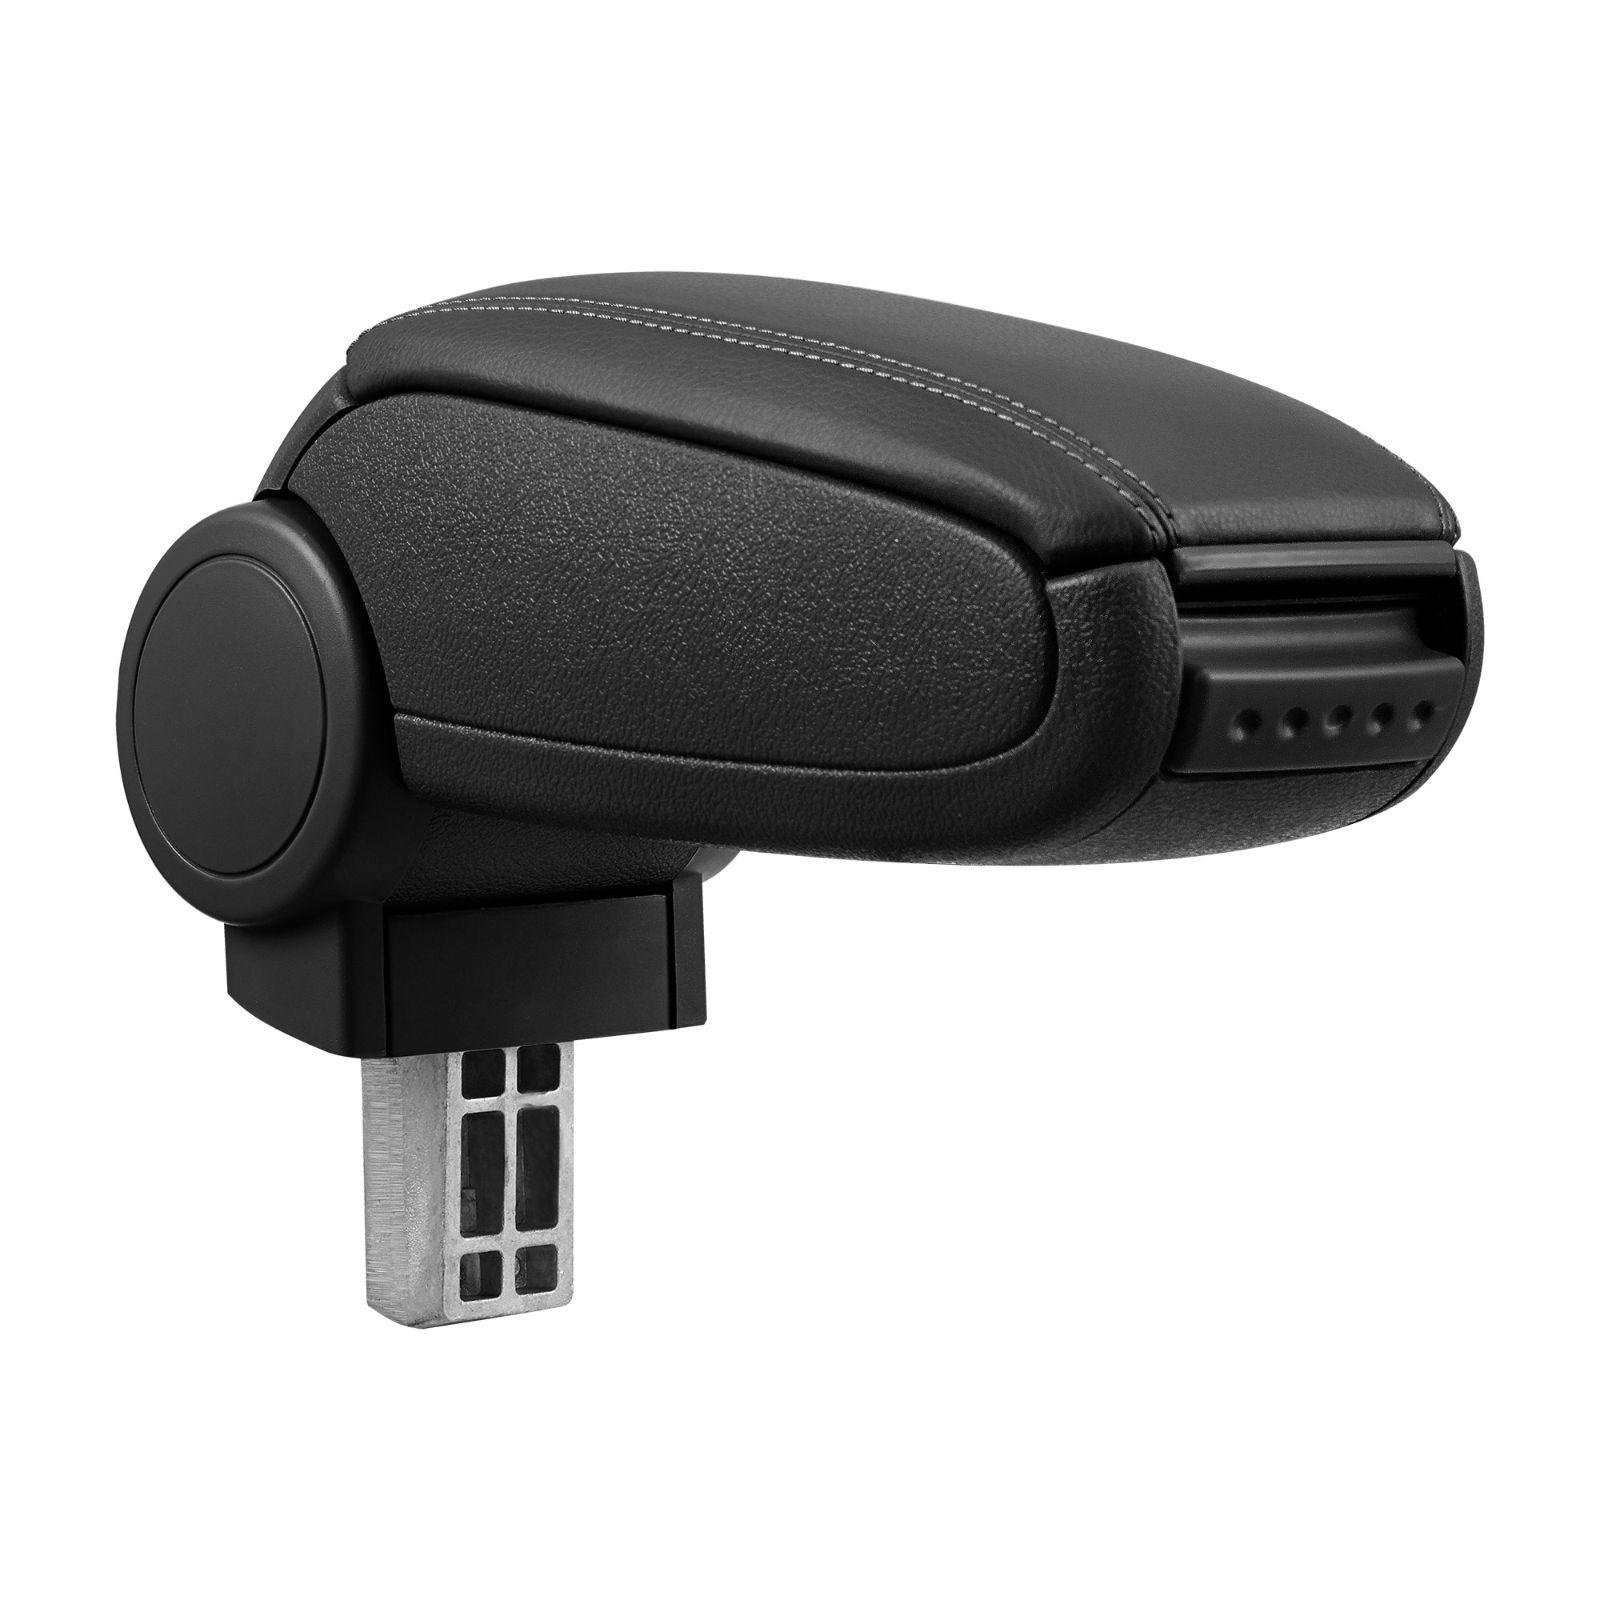 2012+ Reposabrazos negro para adaptarse a Clio IV